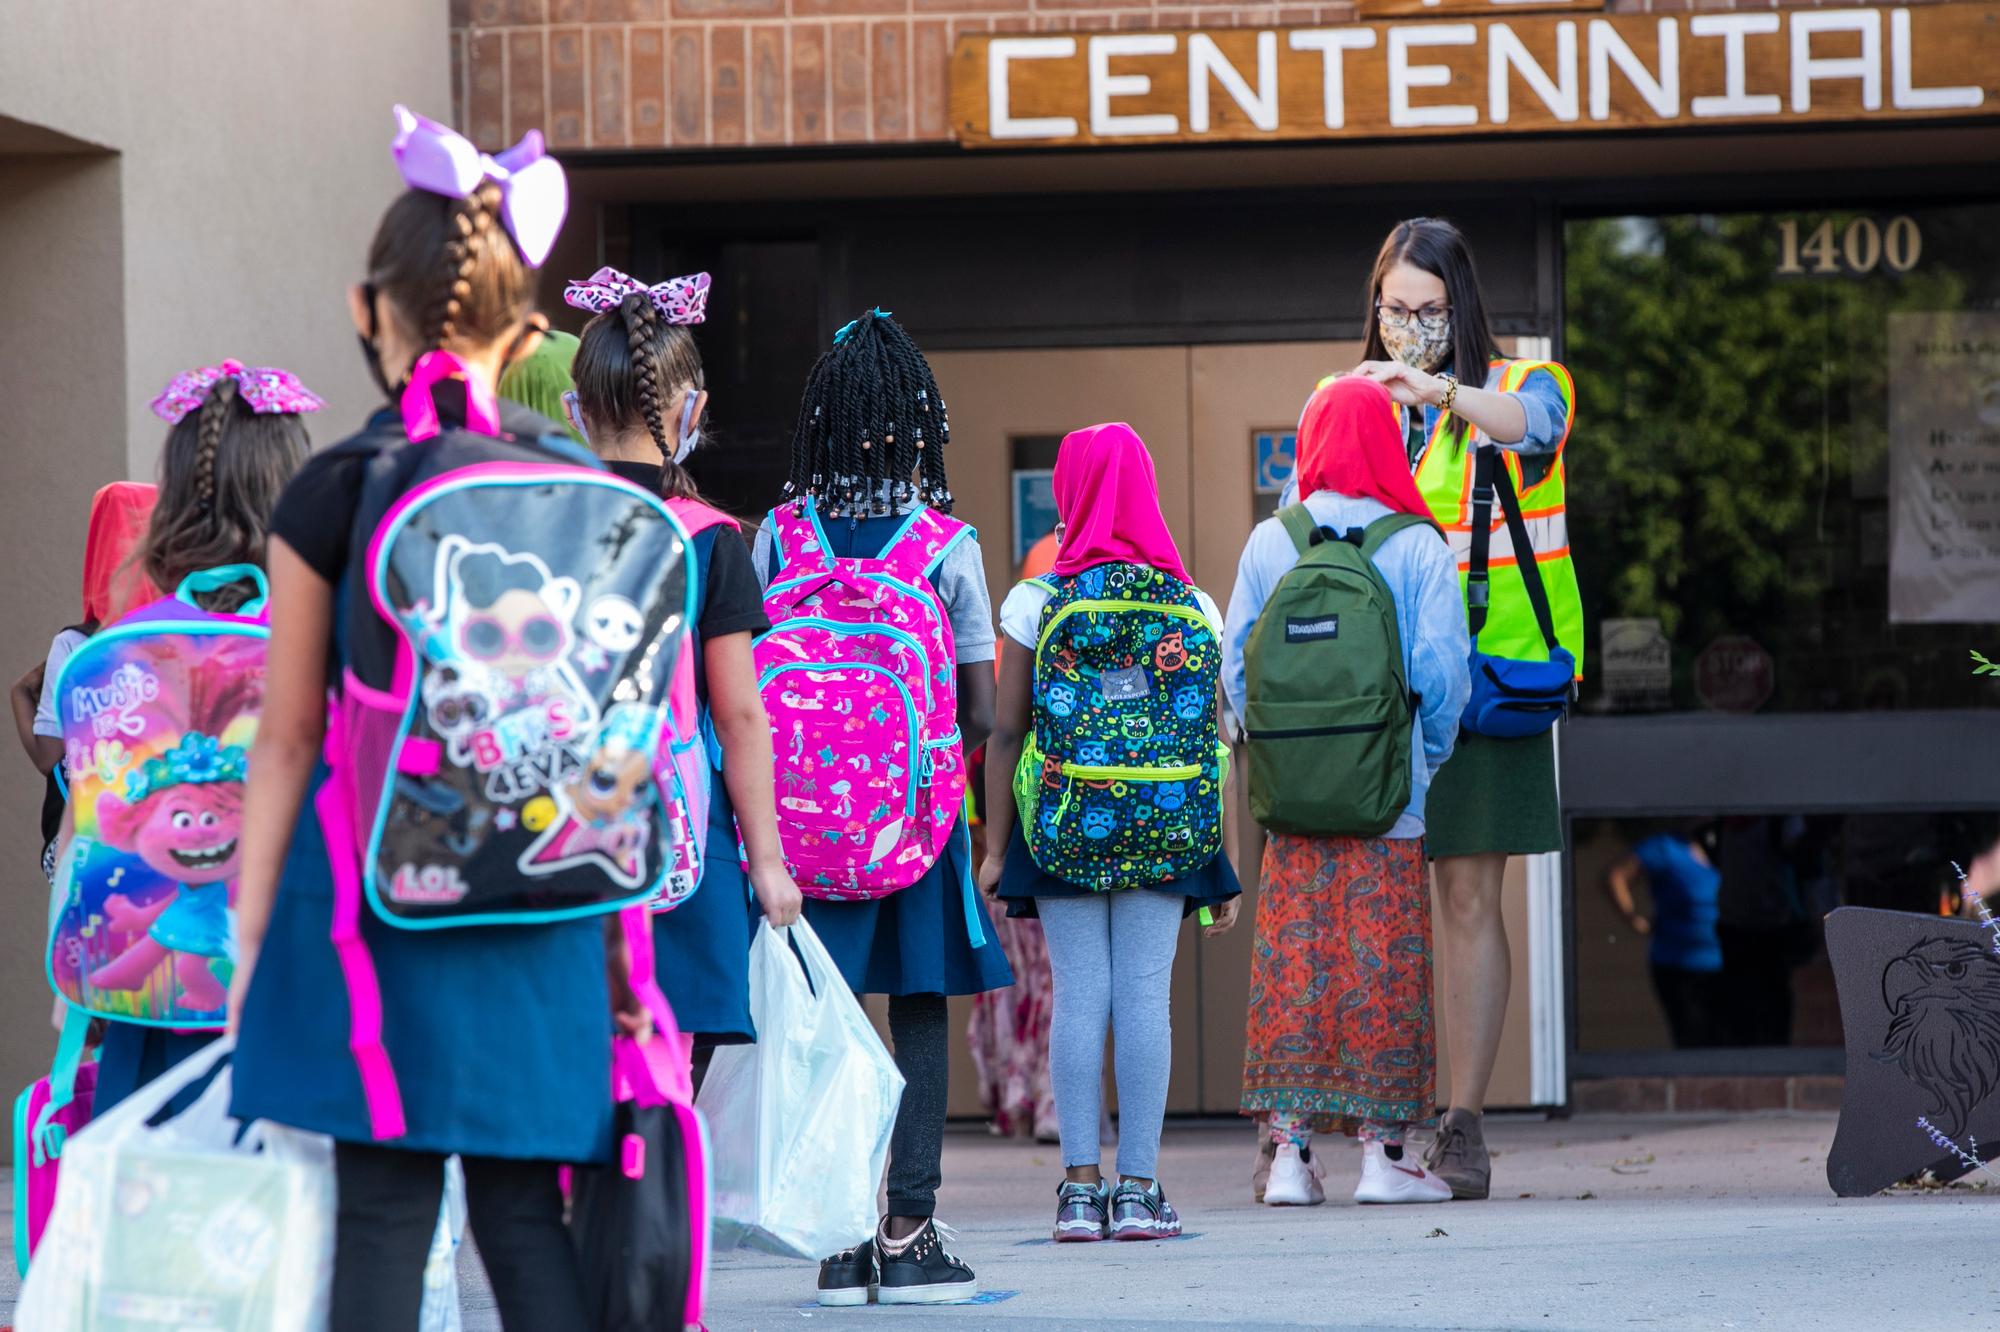 SCHOOL OPENS WELD COUNTY CENTENNIAL ELEMENTARY